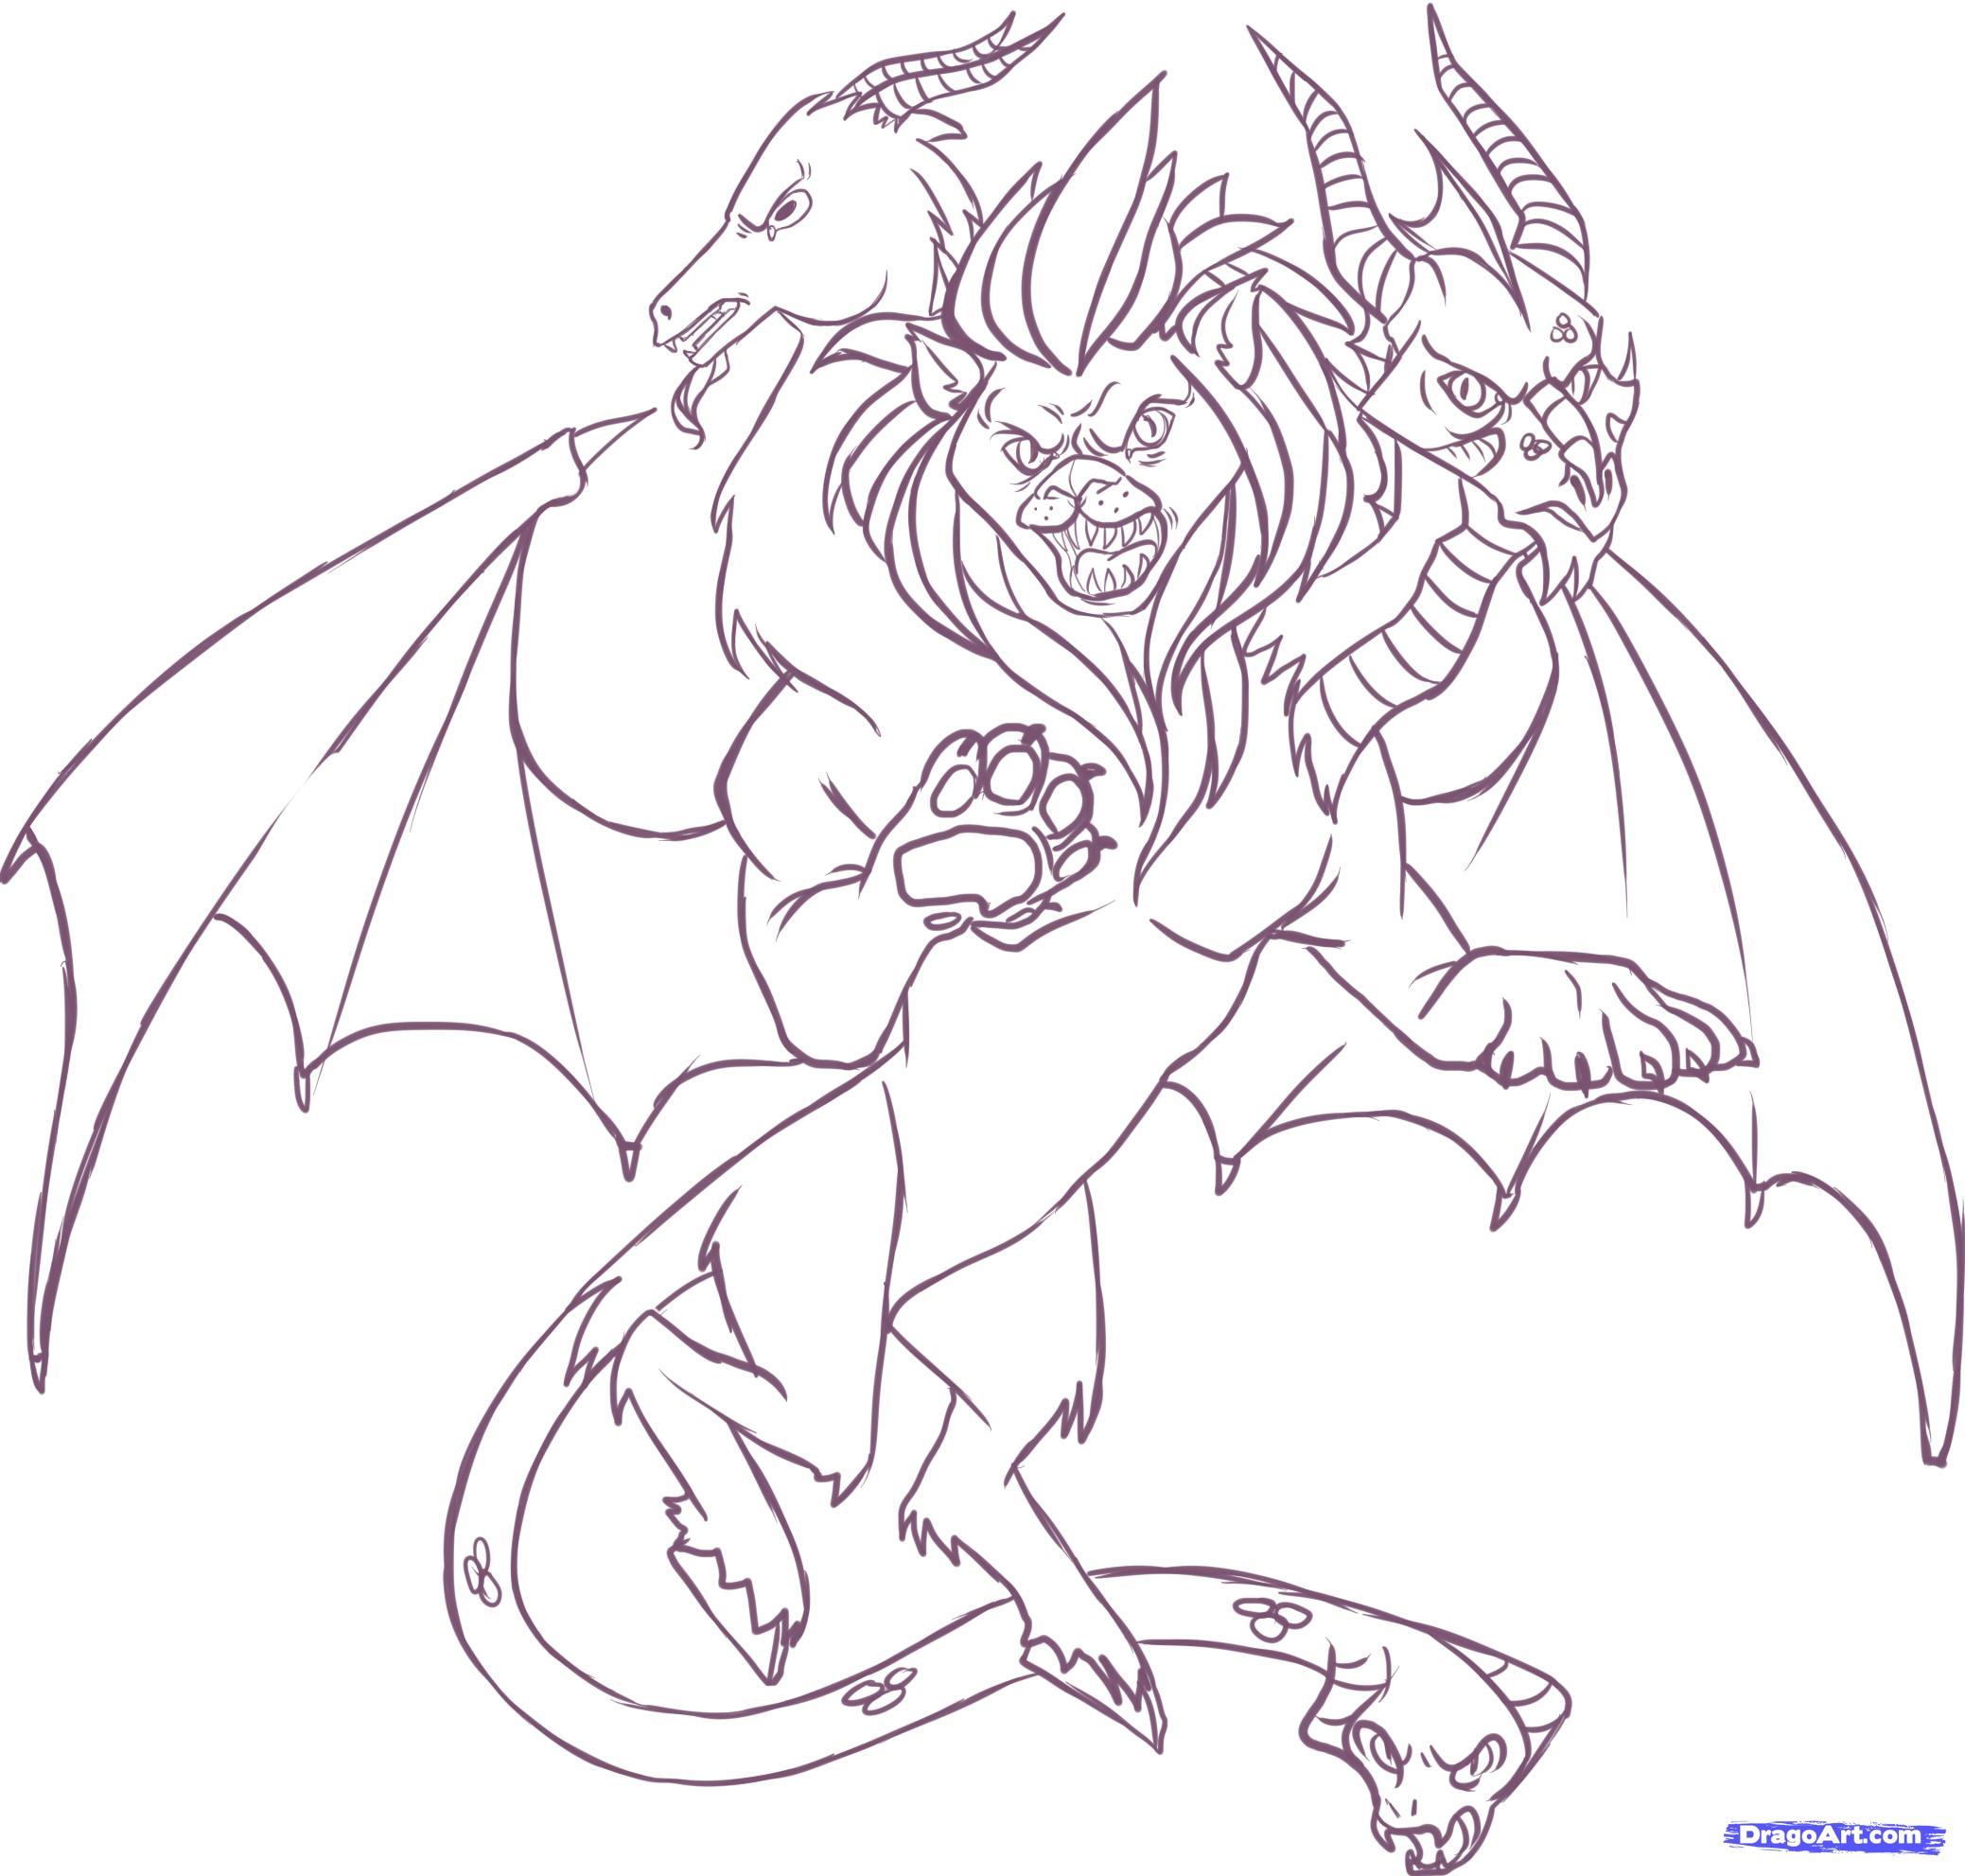 Chimera coloring #12, Download drawings